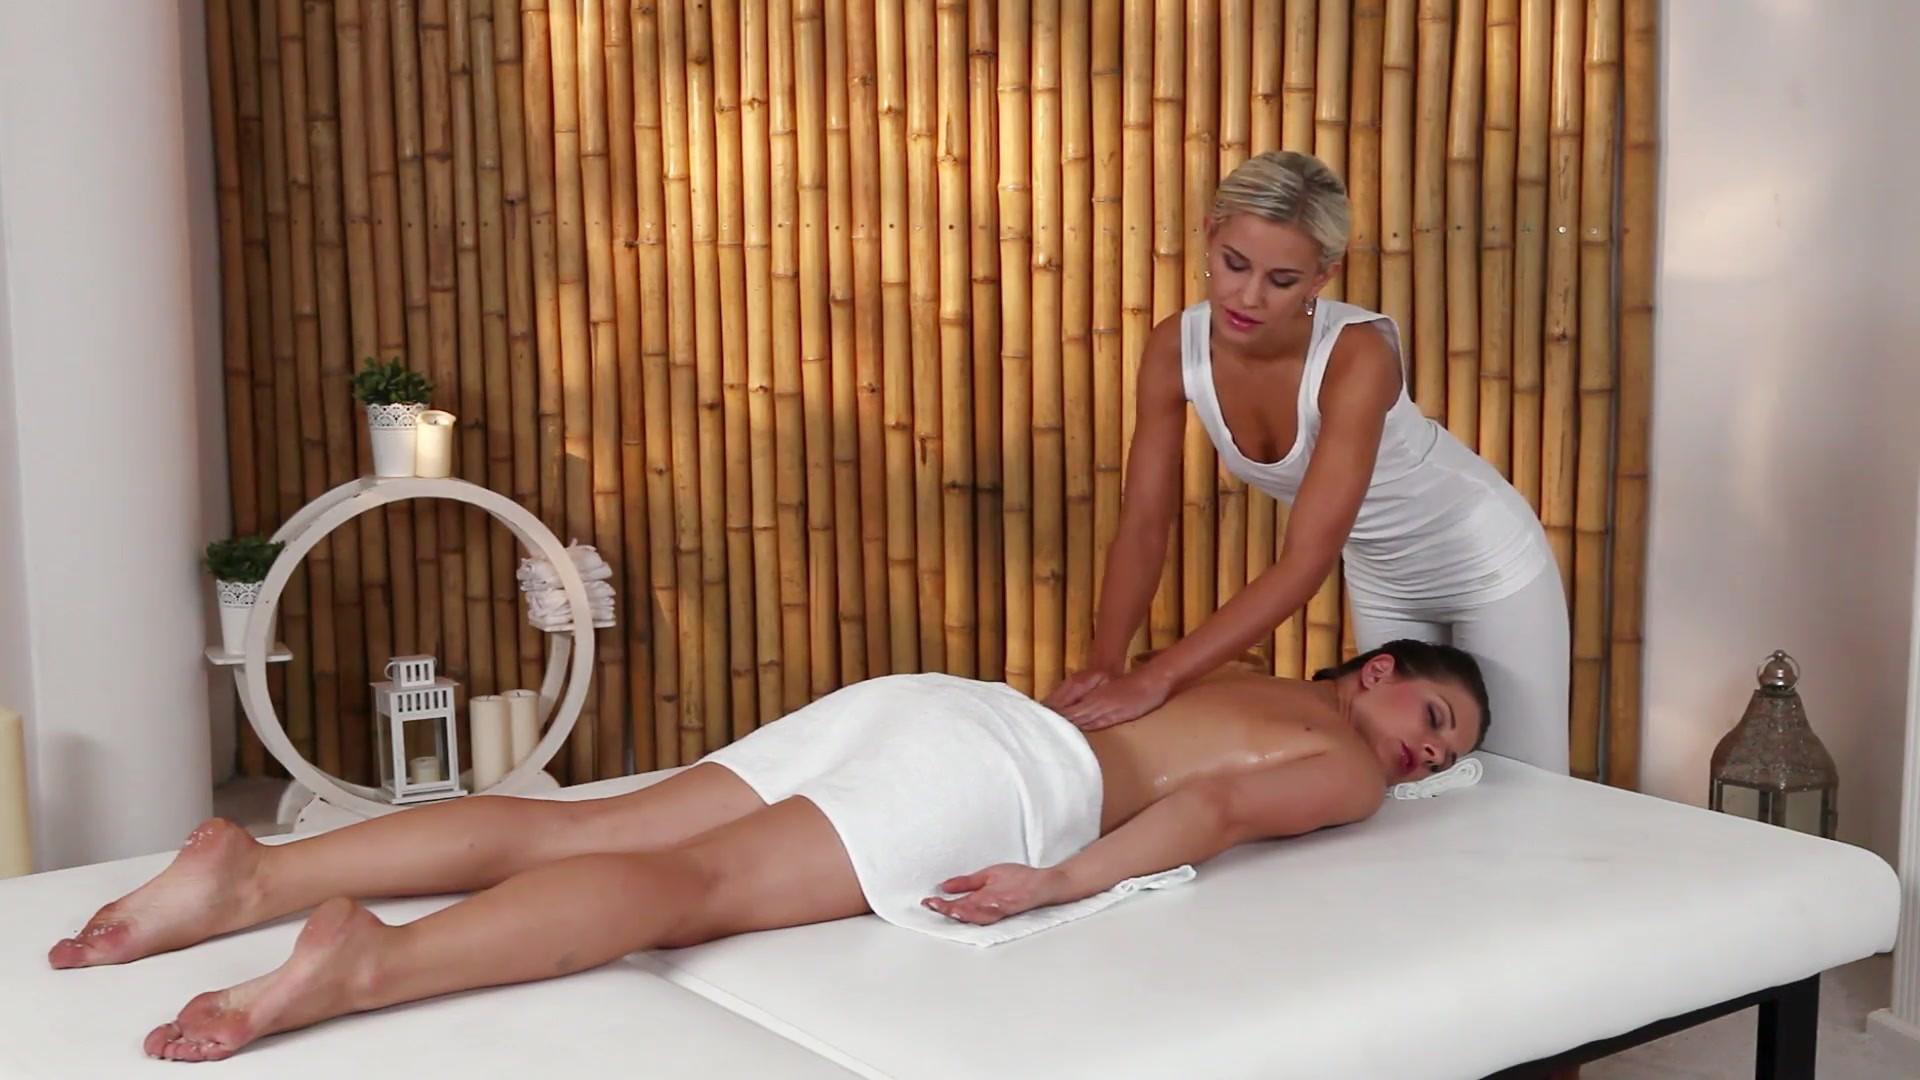 Free massage room porn videos